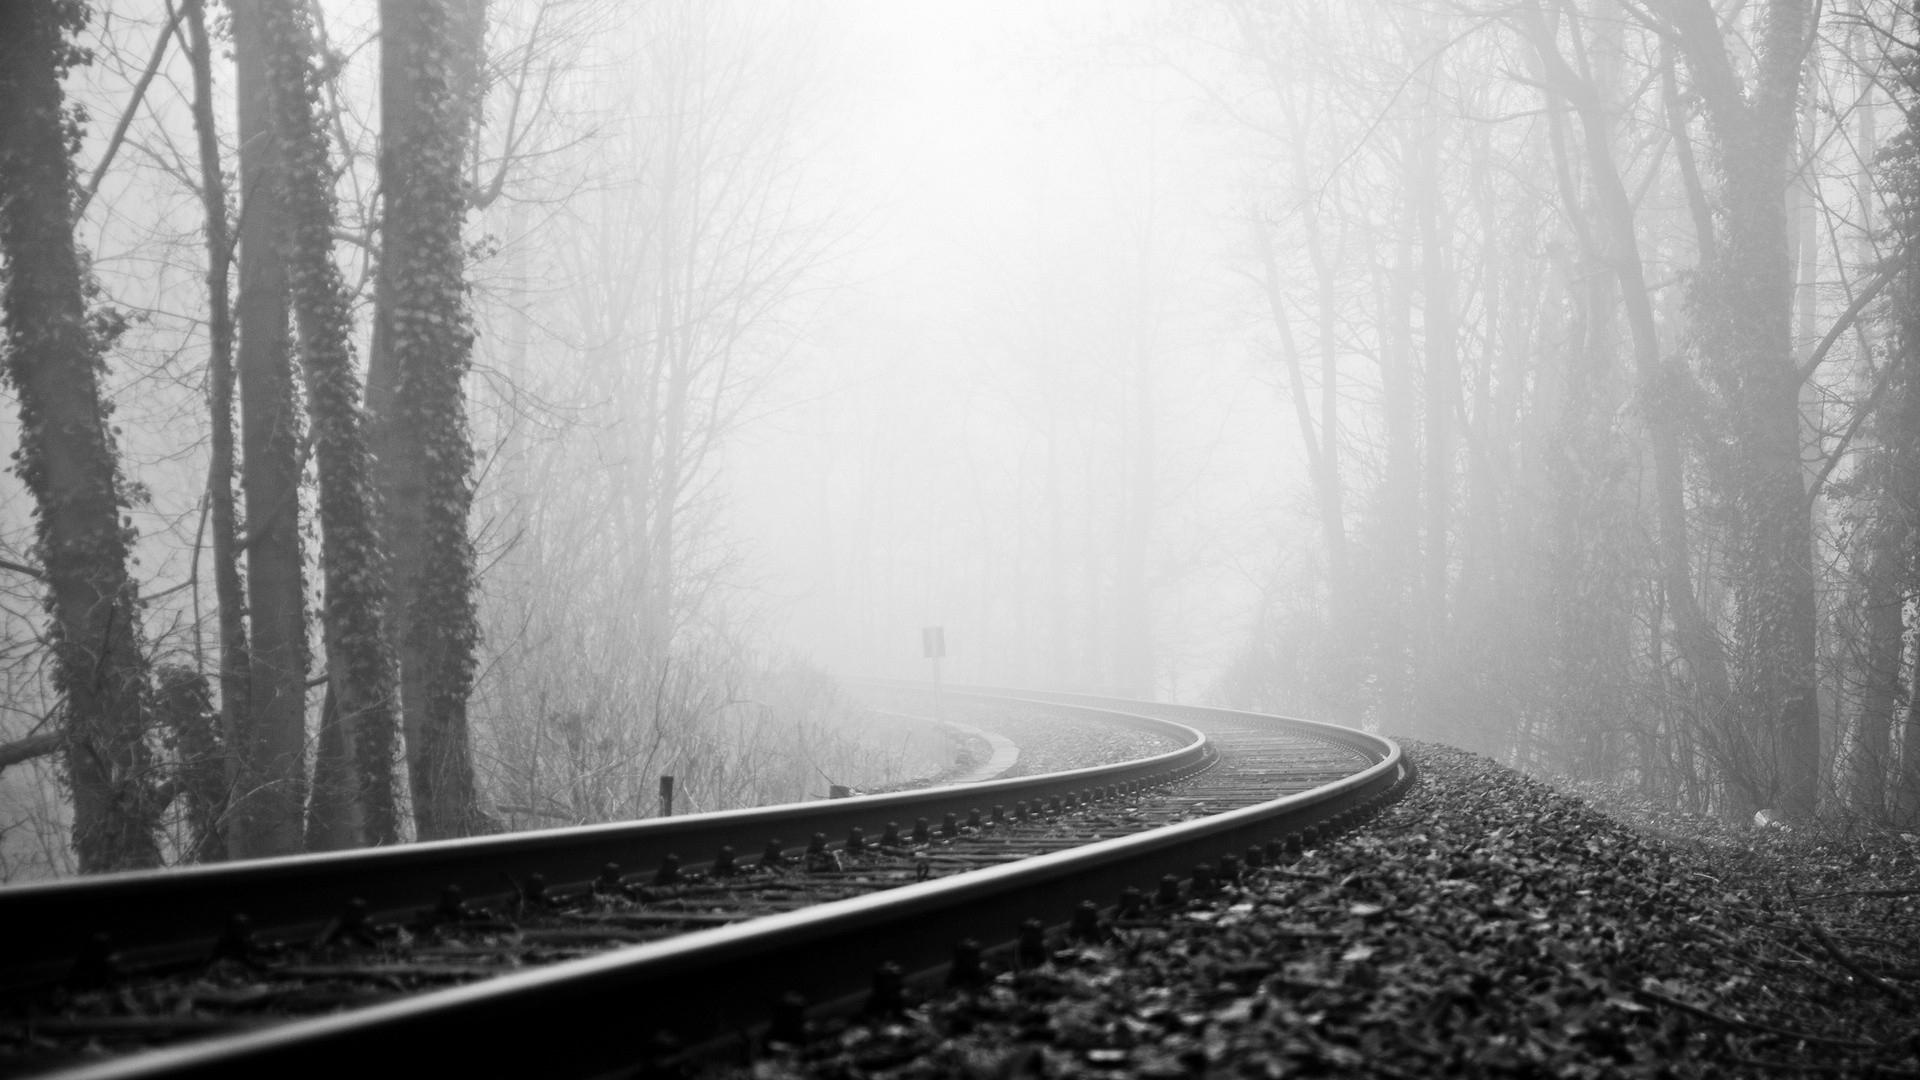 hoontoidly: Sad Black And White Tumblr Backgrounds Images.